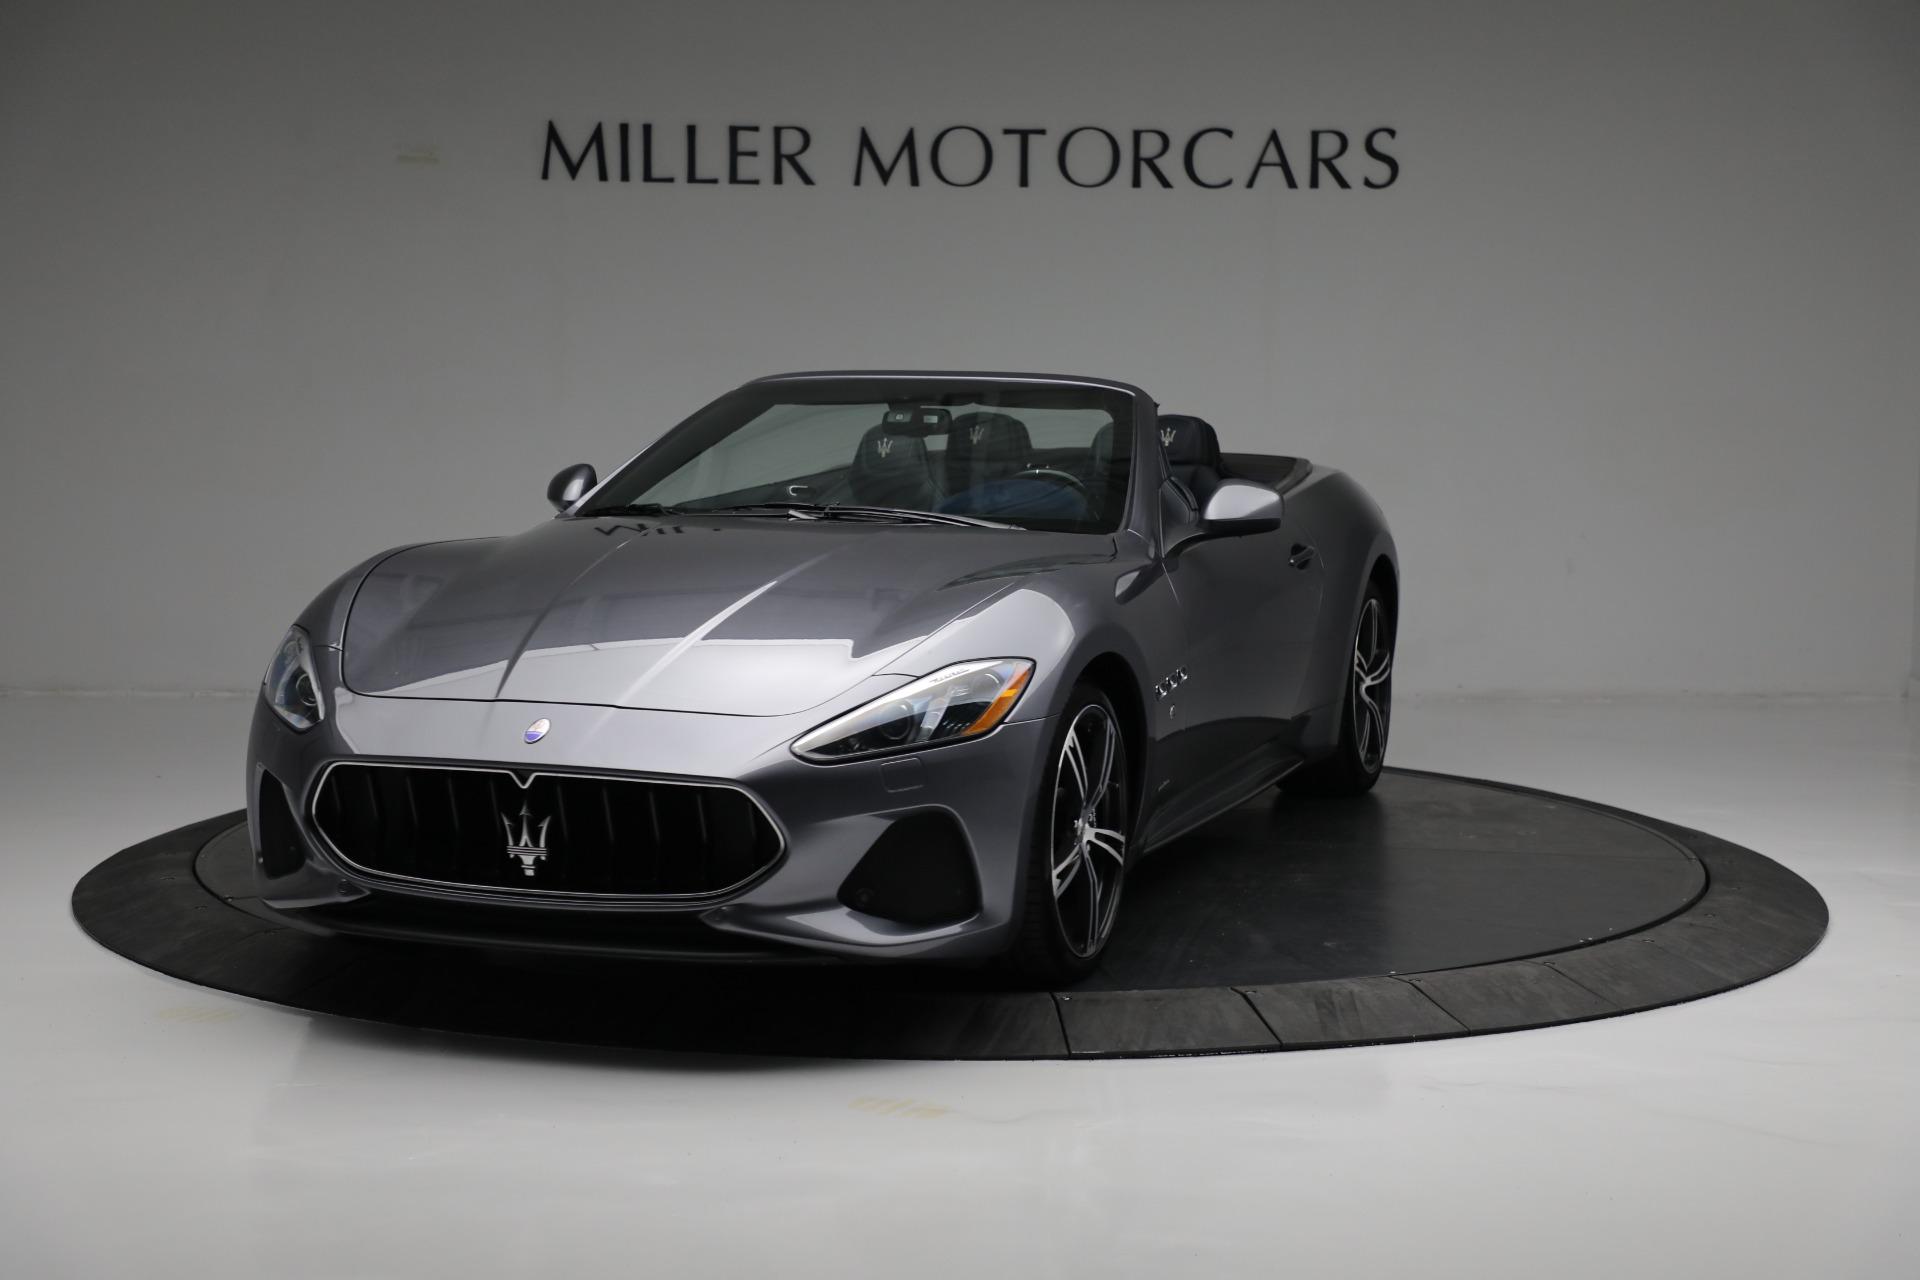 New 2018 Maserati GranTurismo Sport For Sale In Westport, CT 2240_main